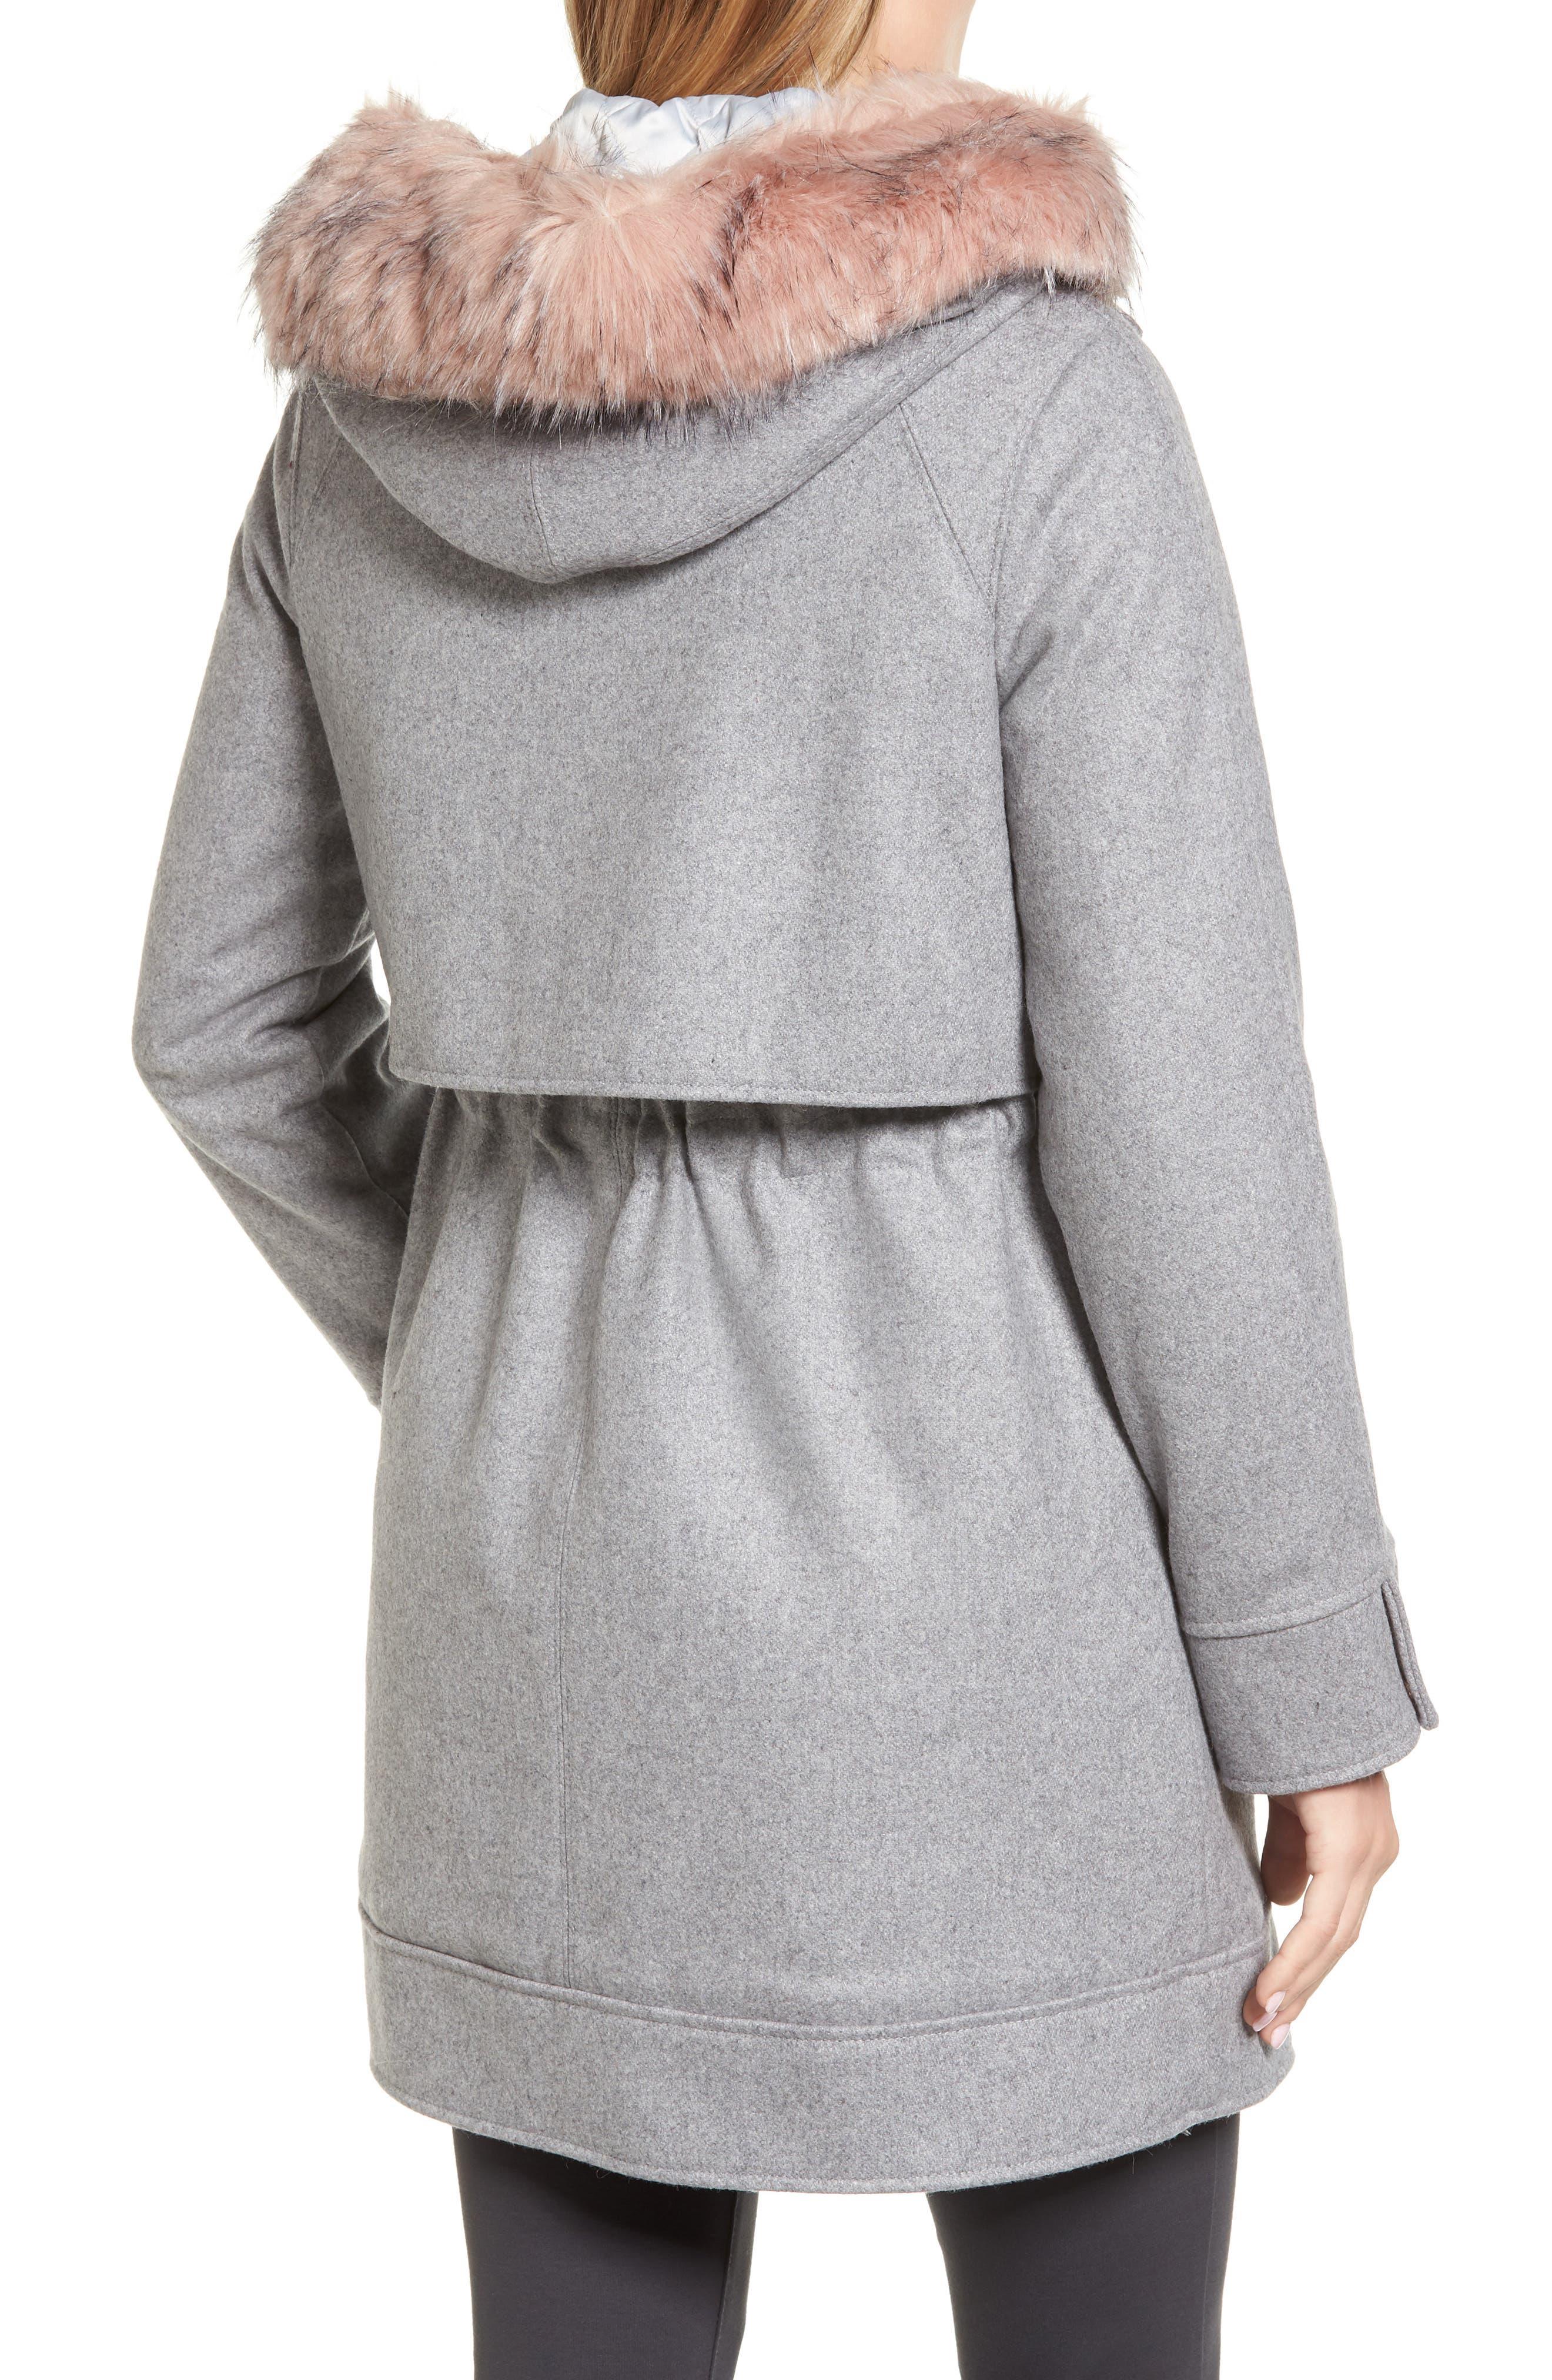 Wool Coat with Faux Fur Trim,                             Alternate thumbnail 2, color,                             050